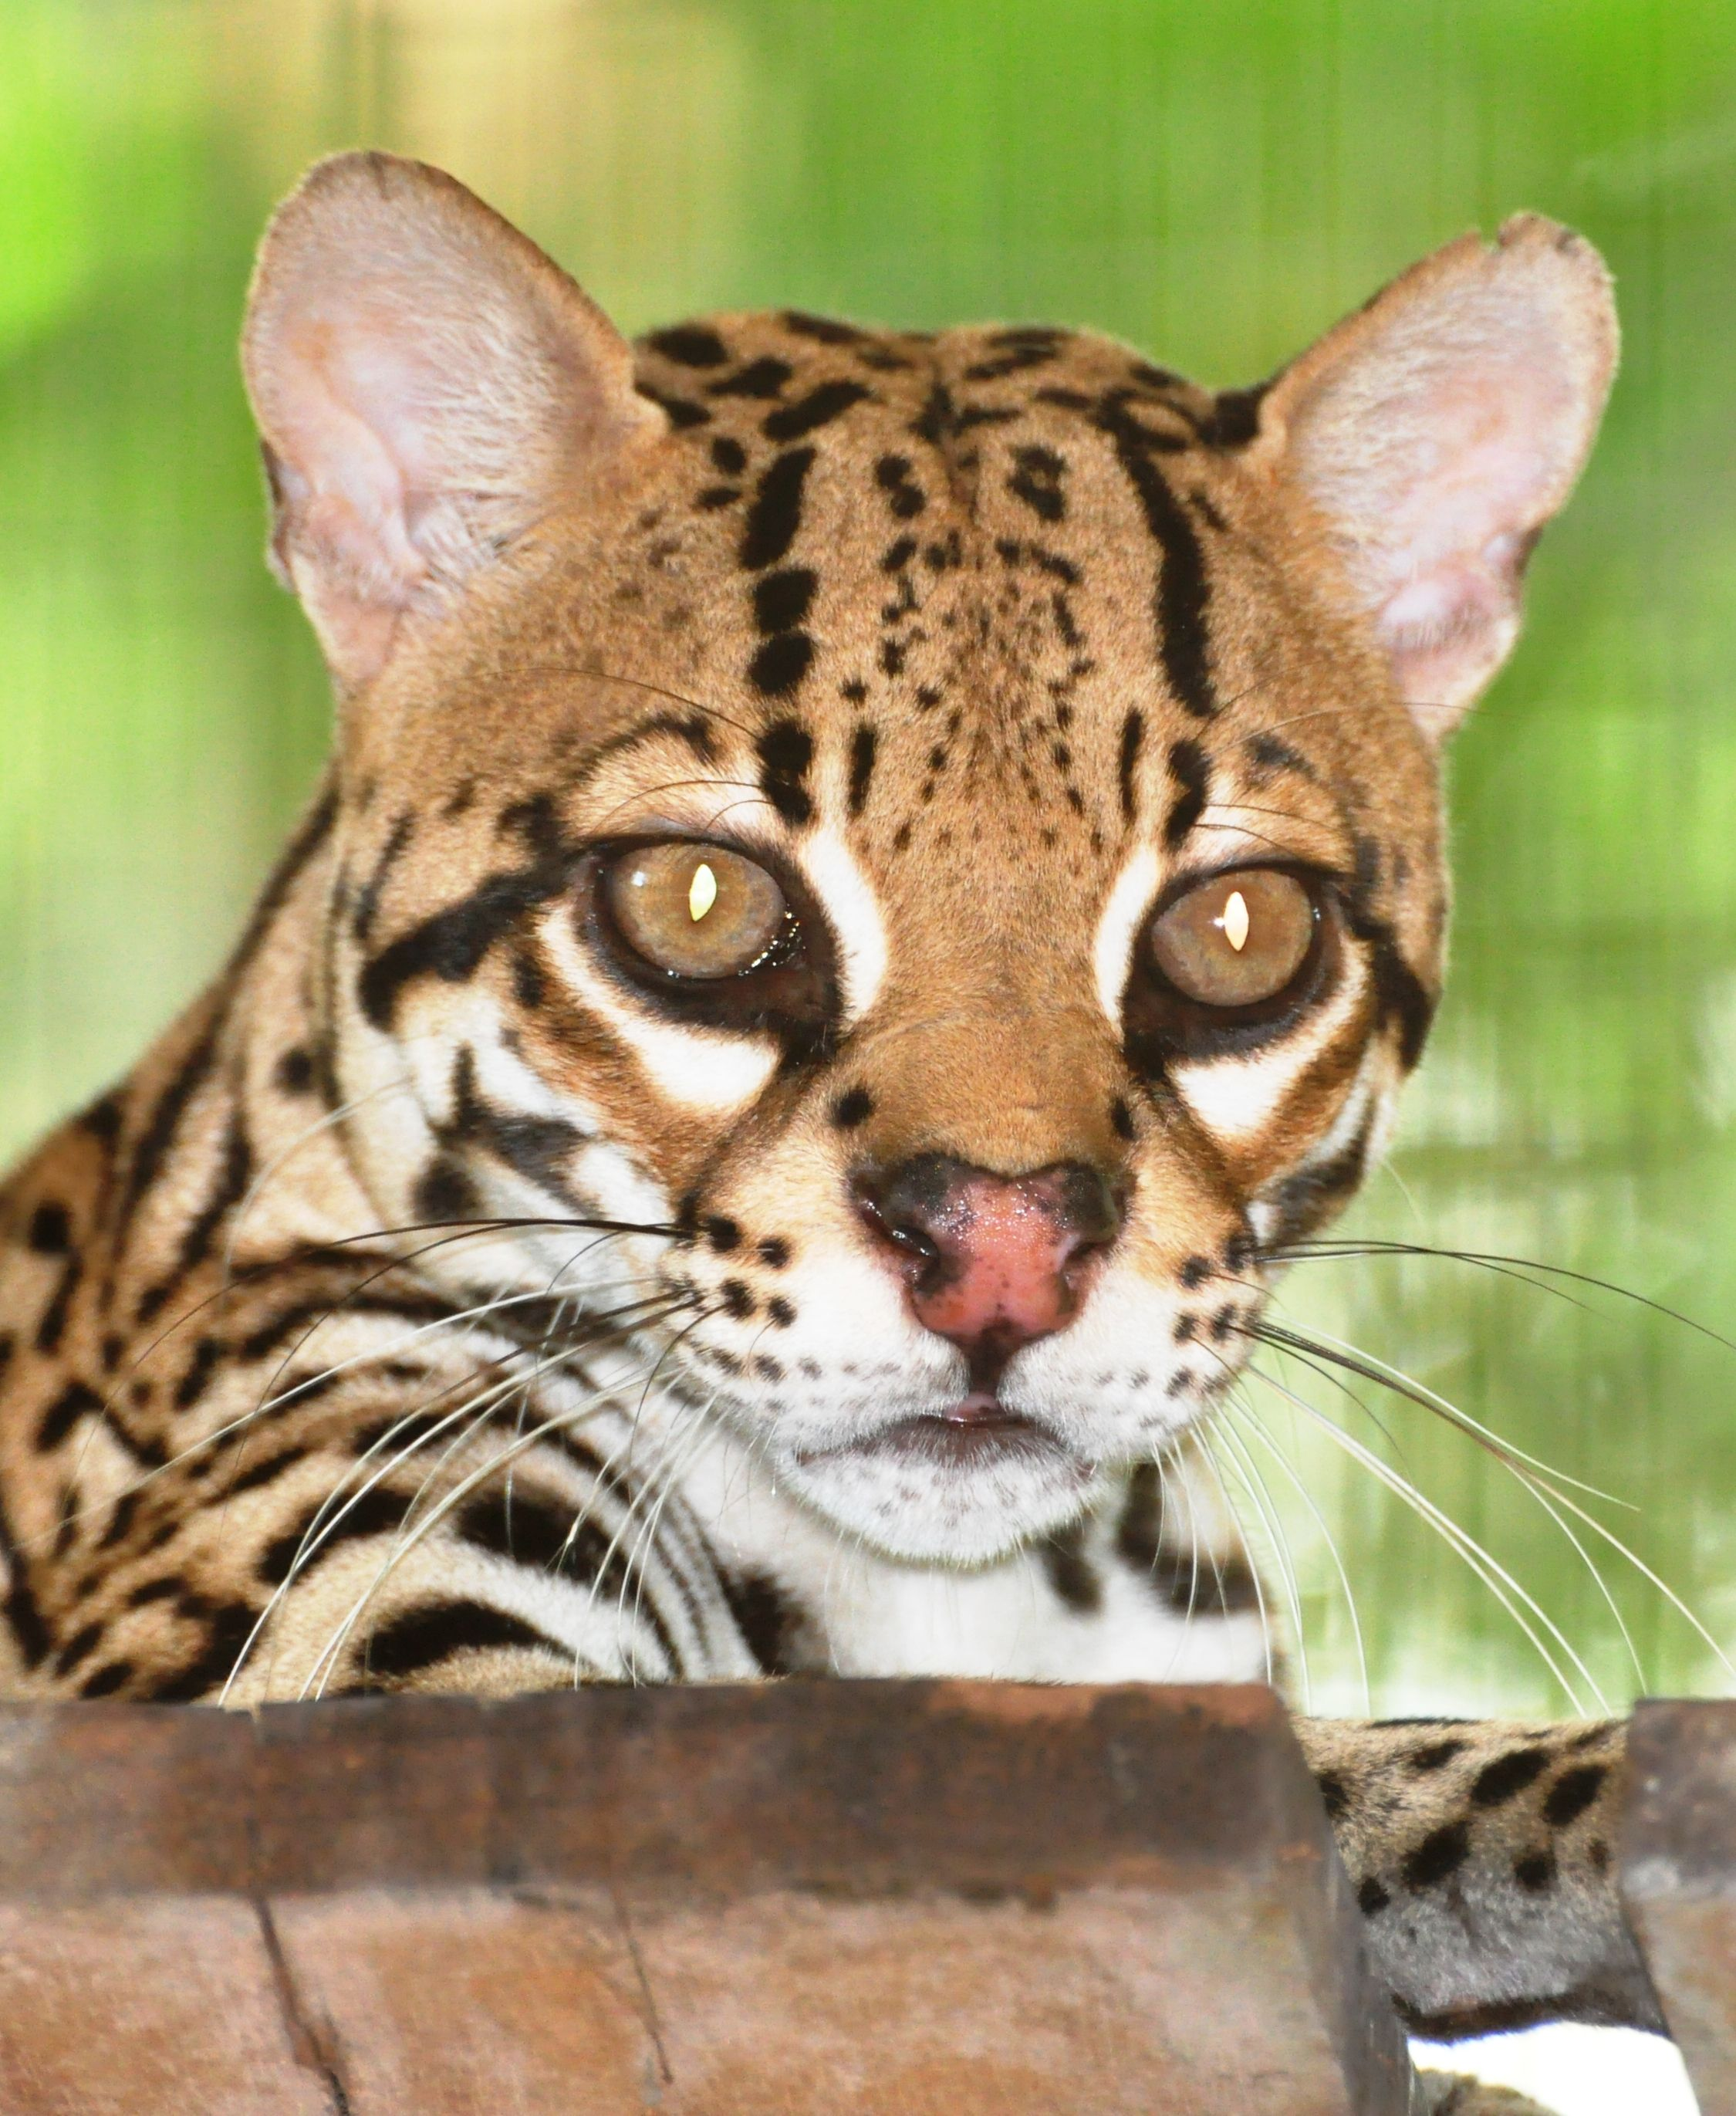 Ocelot in the Amazon Rainforest Wild cats